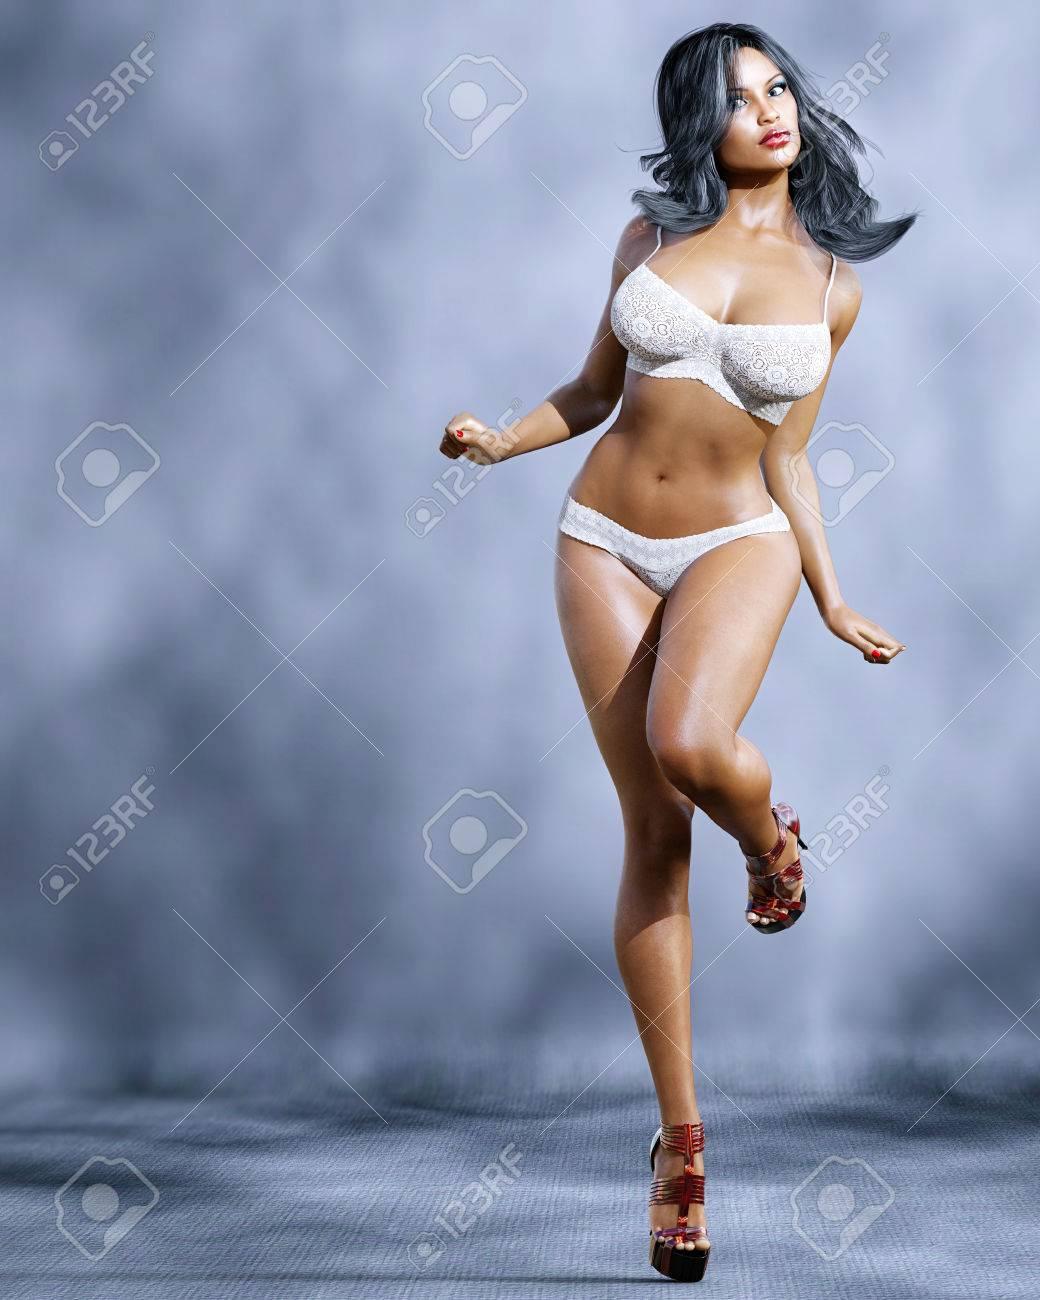 dec8898e07b65 High sexy mulatto woman in lingerie. Bra and panties. Conceptual fashion art.  Blue